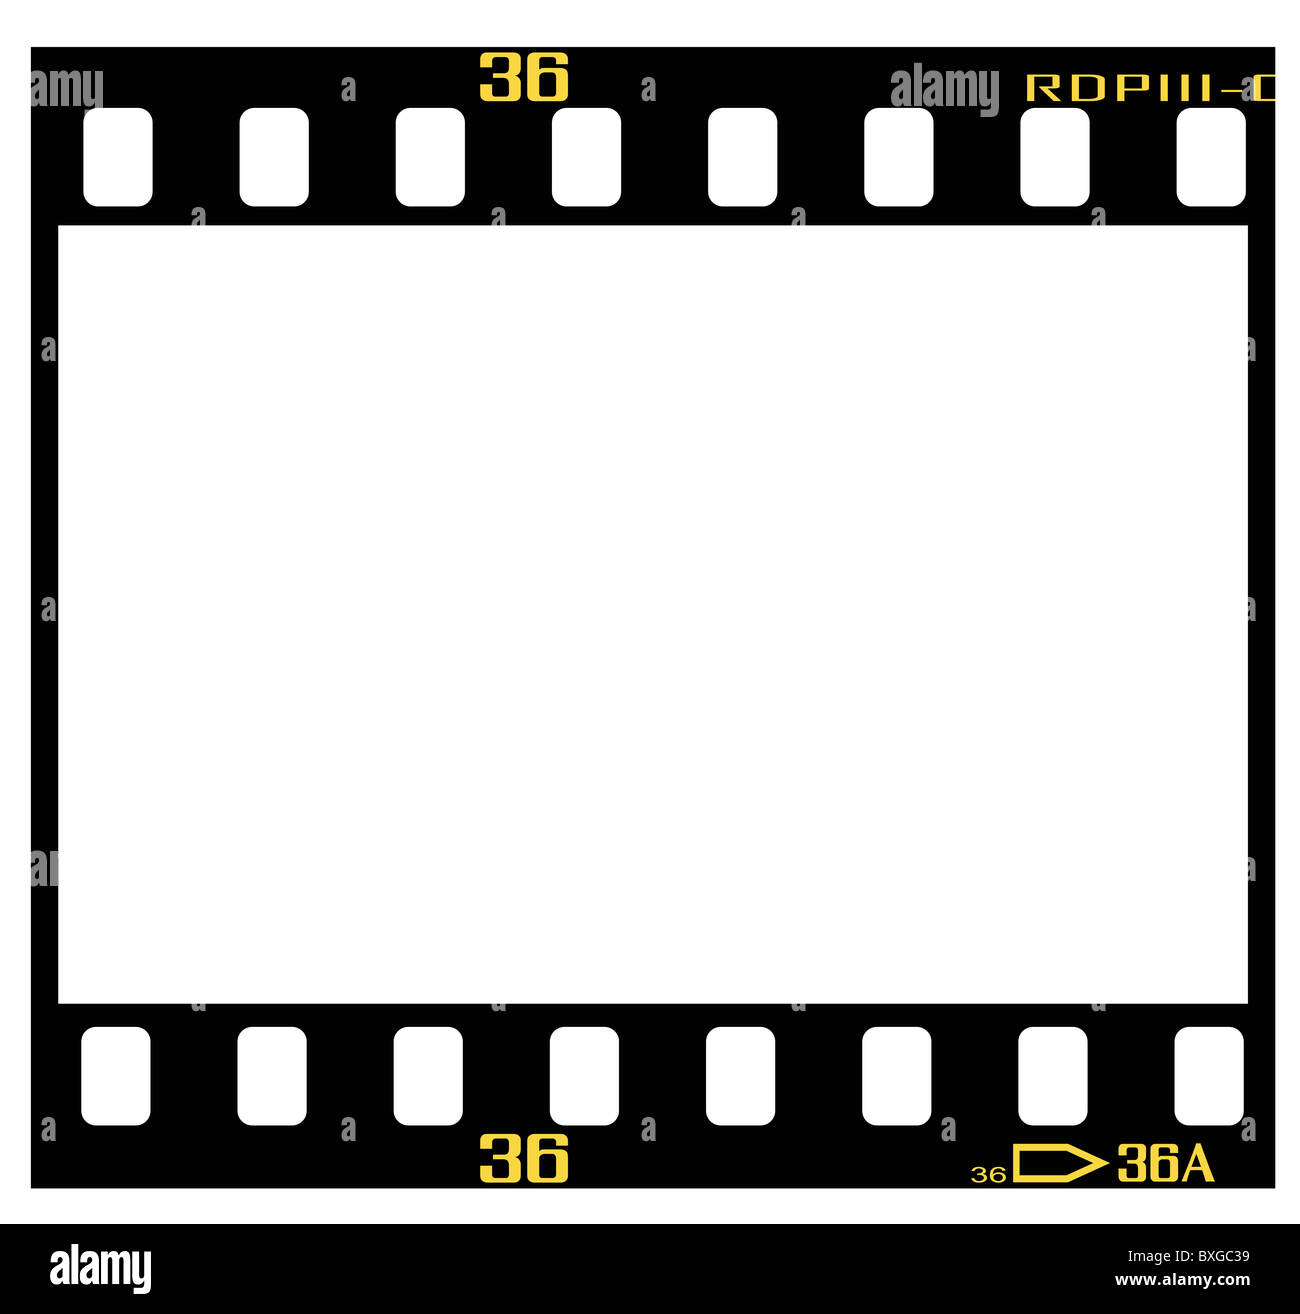 Gemütlich Film Filmbilderrahmen Bilder - Rahmen Ideen ...